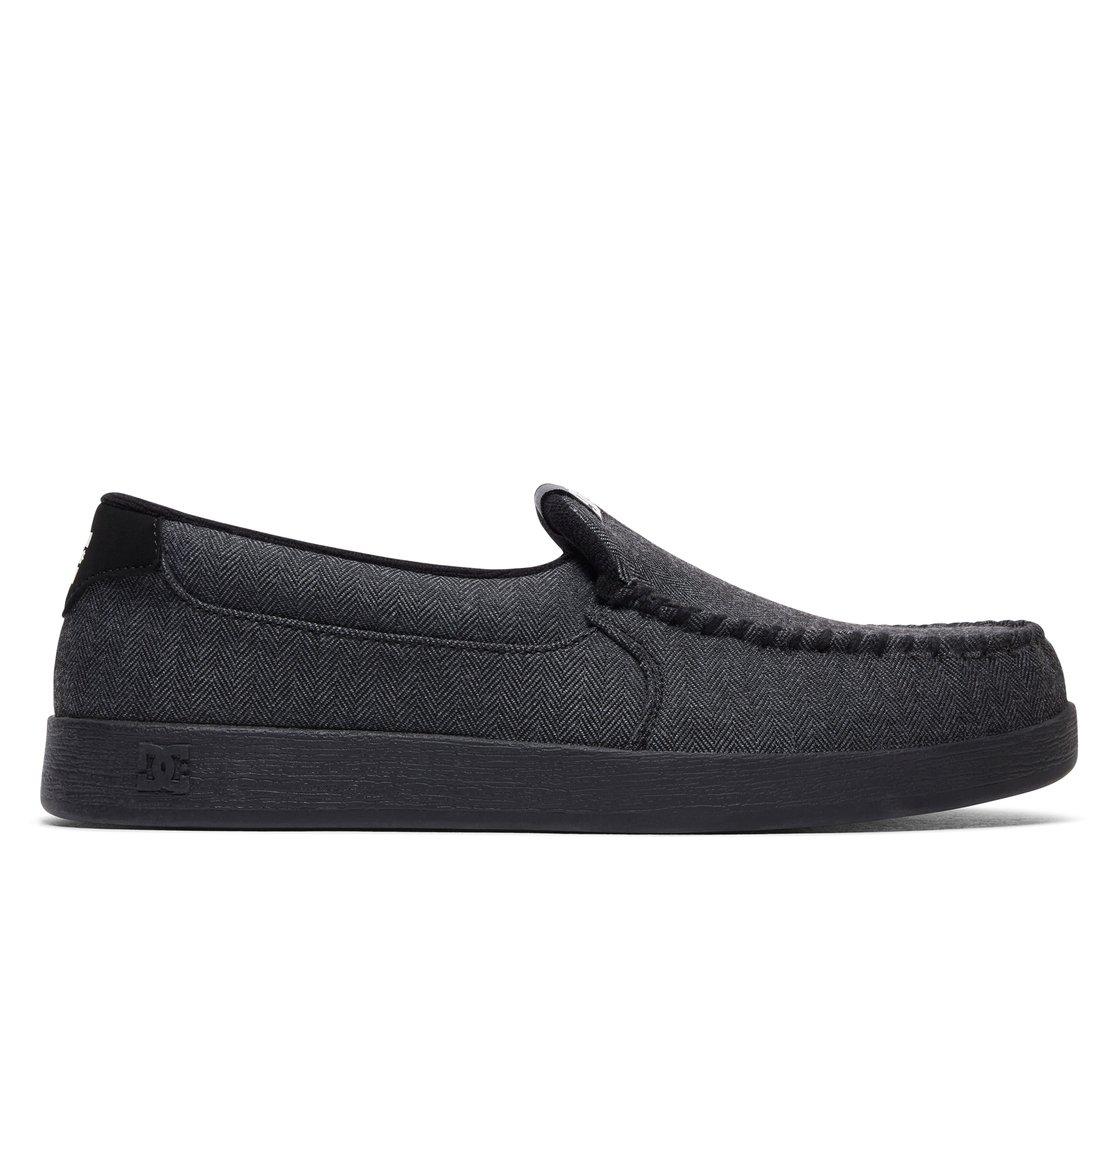 DC Shoes Men's Villain TX Slip on Low Top Shoes Gray White (GWH) 8.5 GjRnRbt5vg